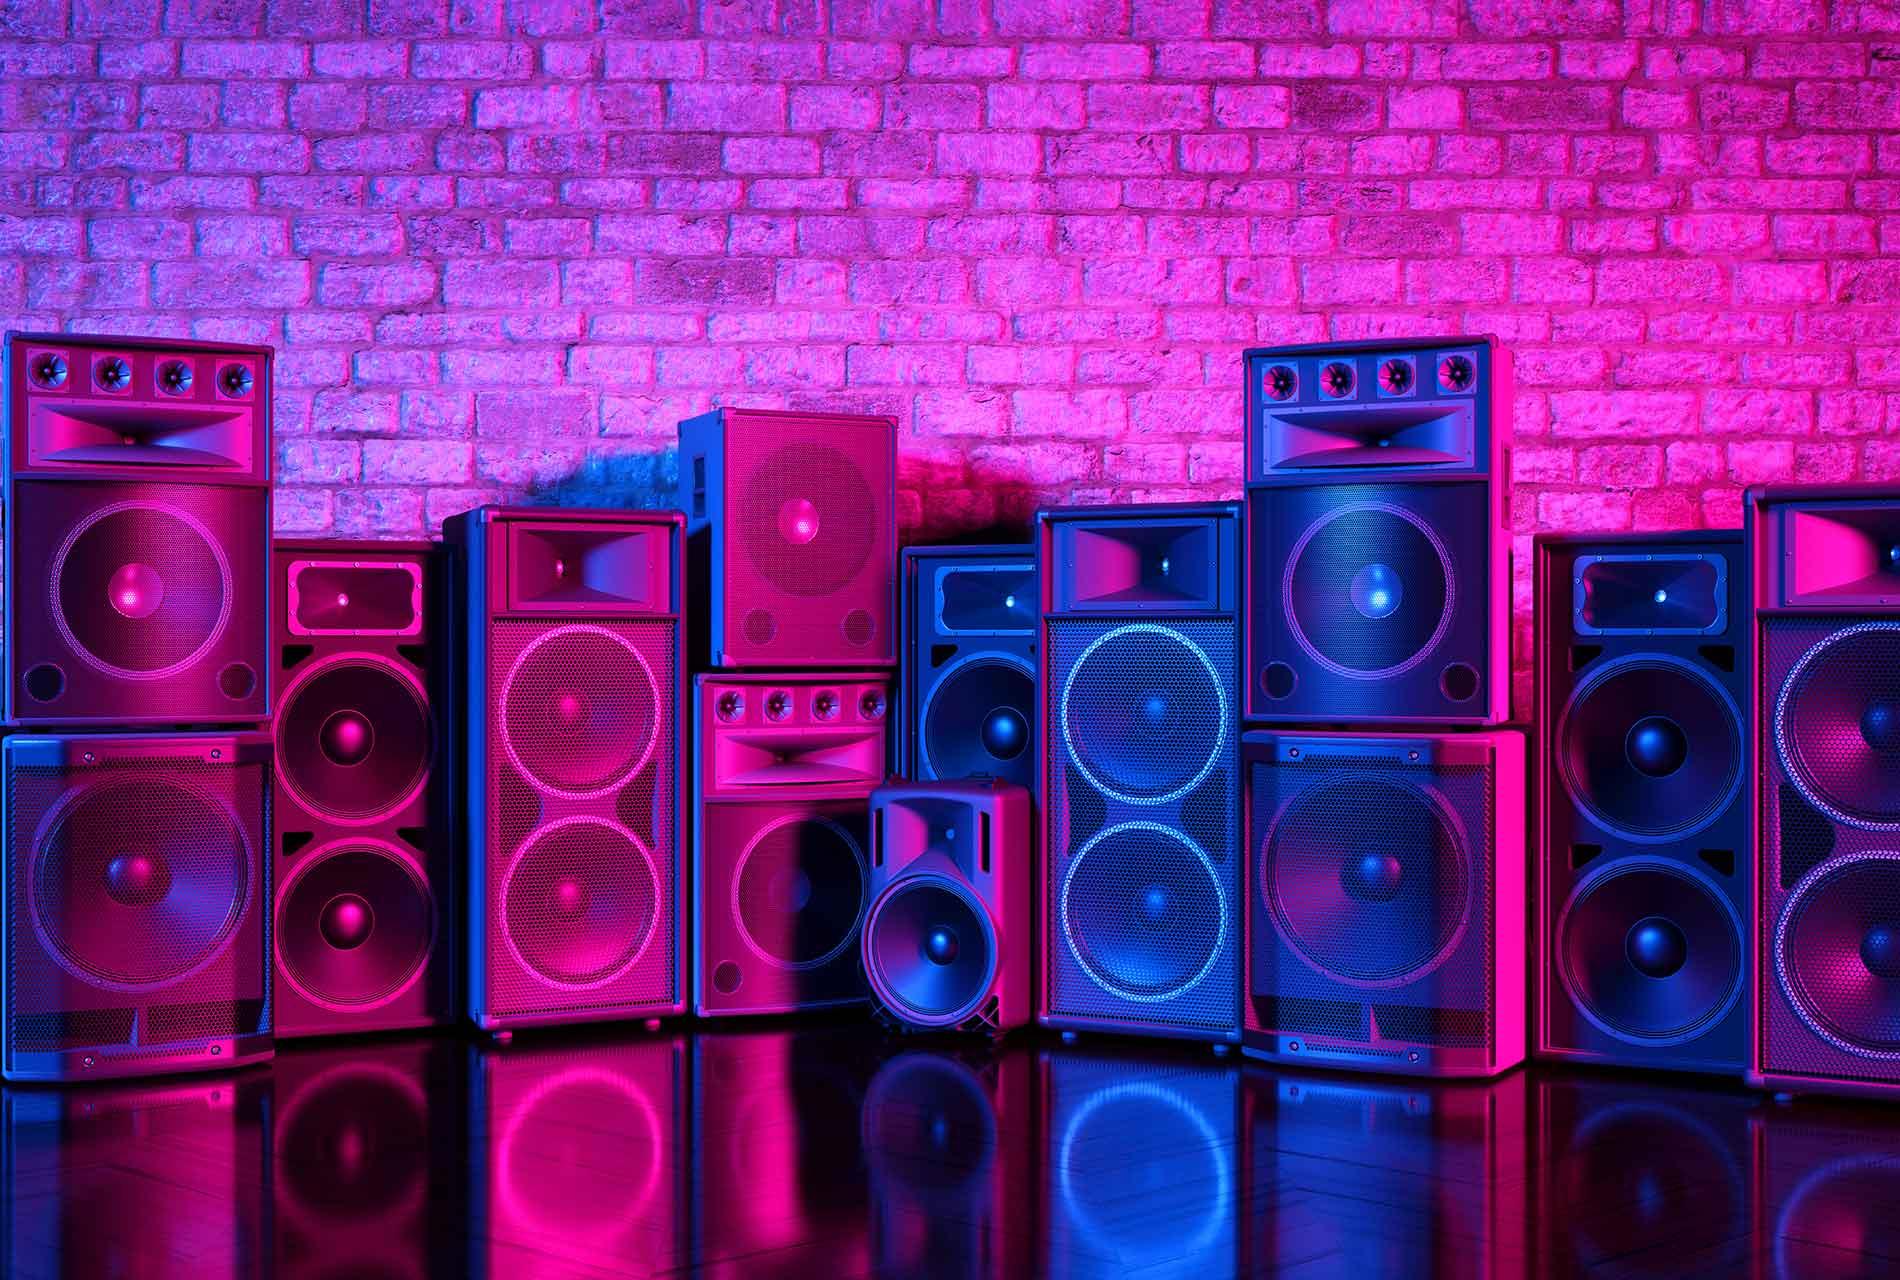 Lautsprecher - Standlautsprecher & Lautsprecherboxe